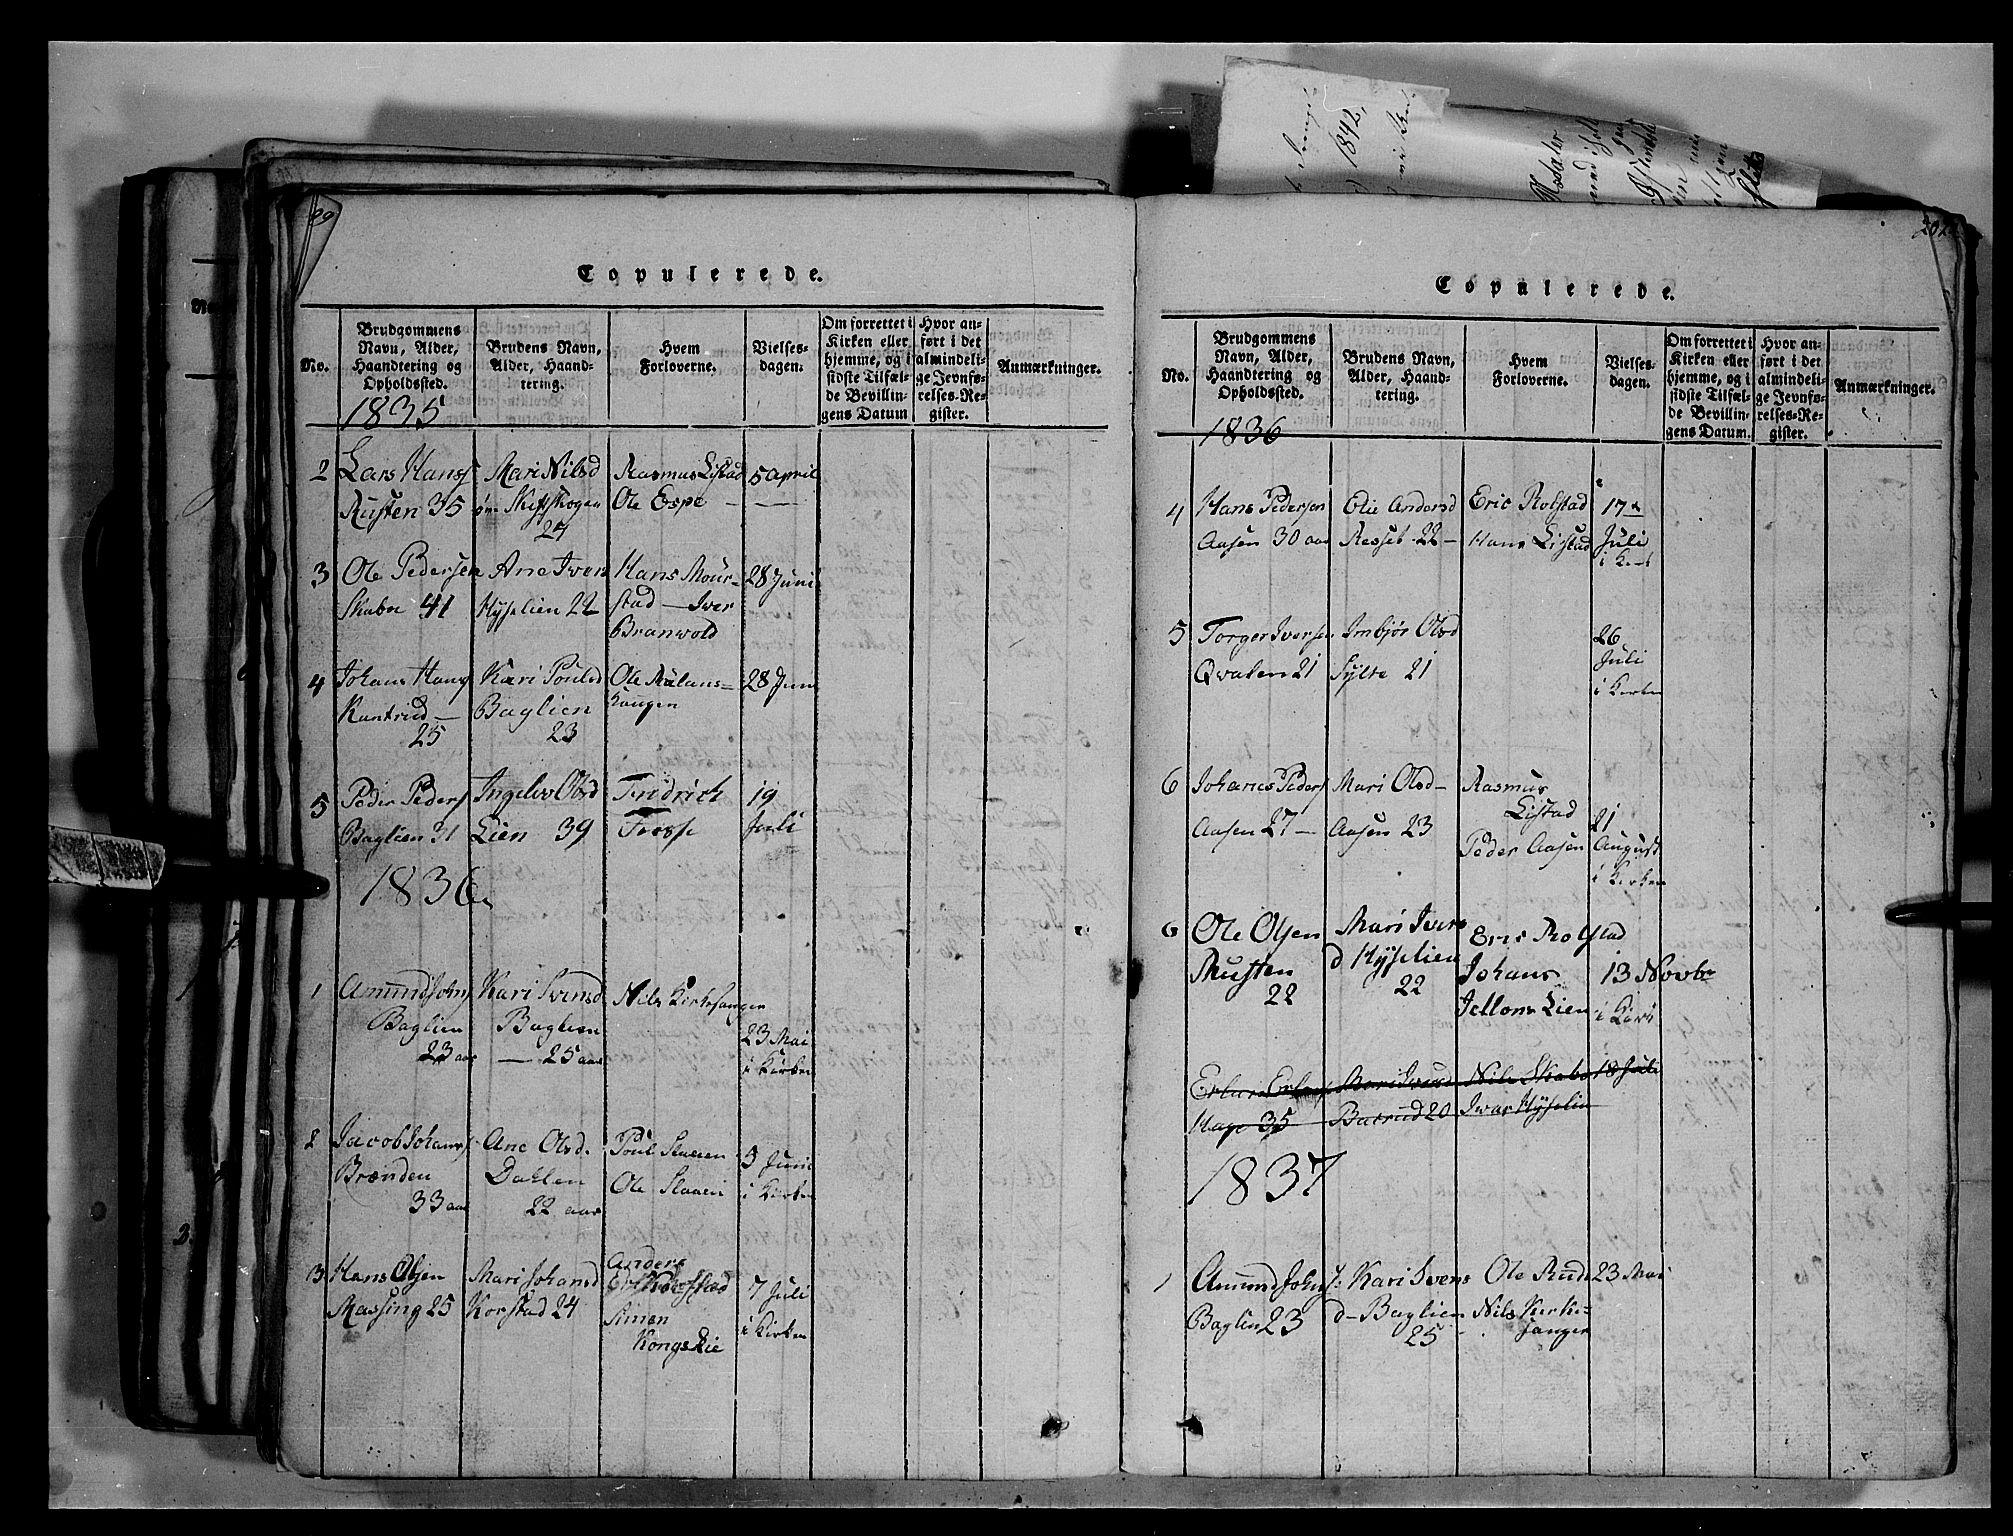 SAH, Fron prestekontor, H/Ha/Hab/L0003: Klokkerbok nr. 3, 1816-1850, s. 200